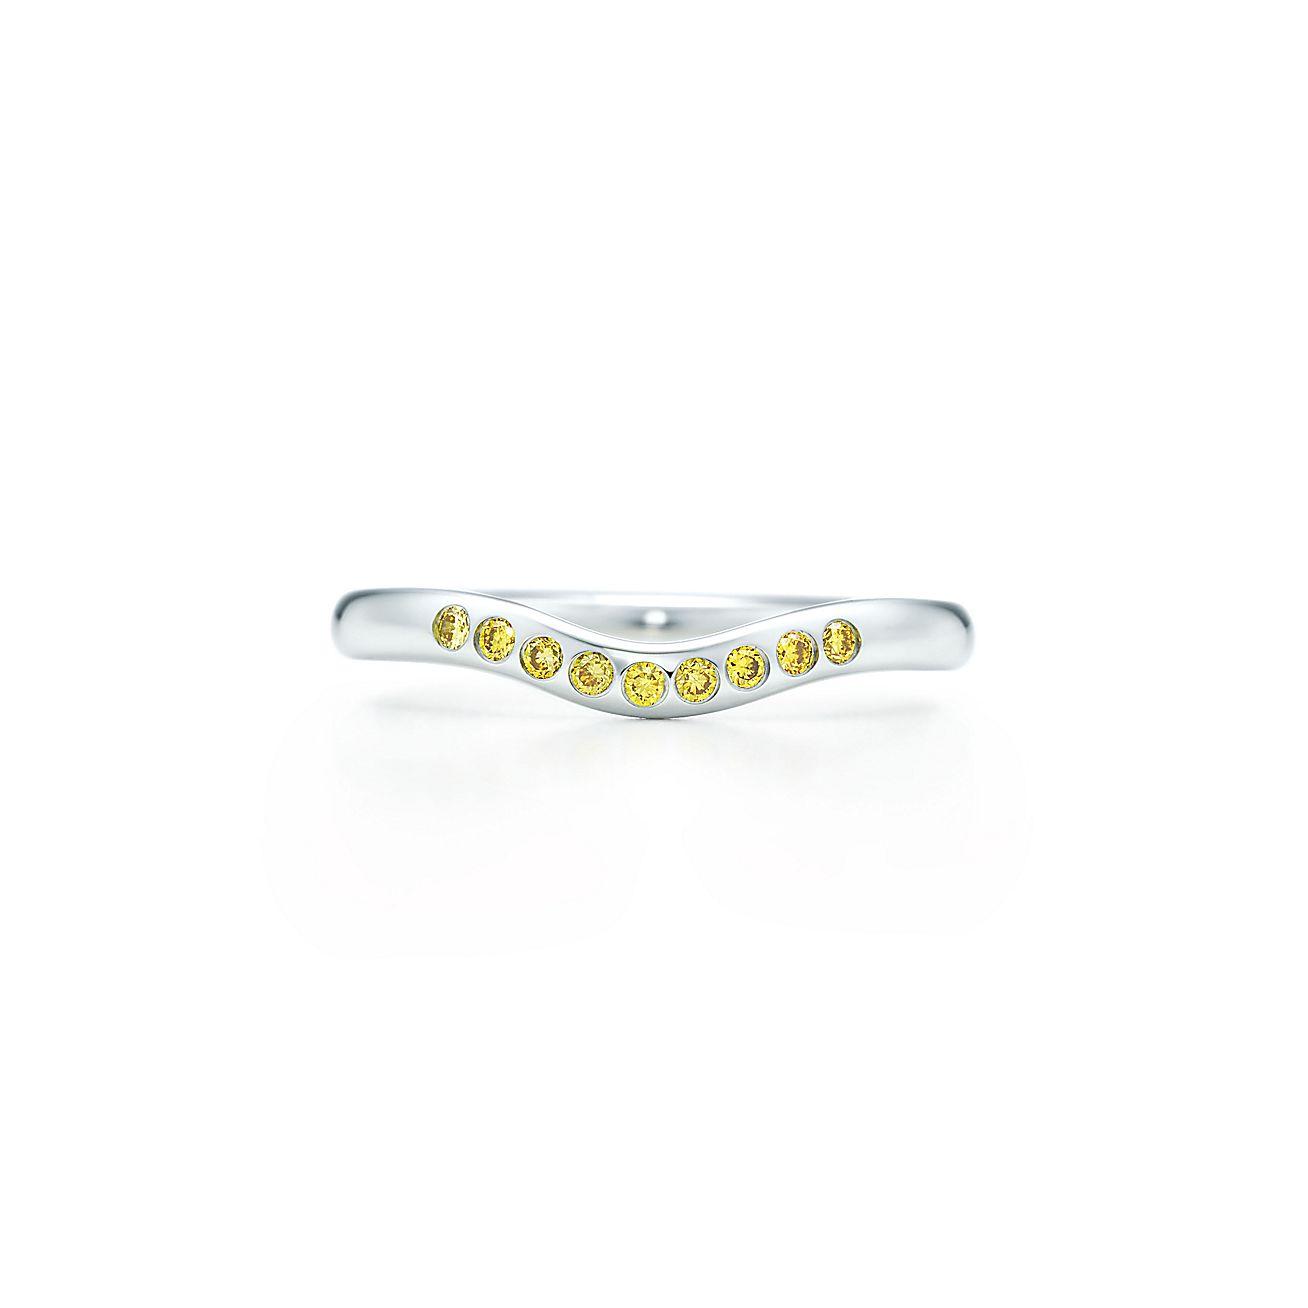 Elsa Peretti Wedding Band In Platinum With Tiffany Yellow Diamonds 2 Mm Wide Co